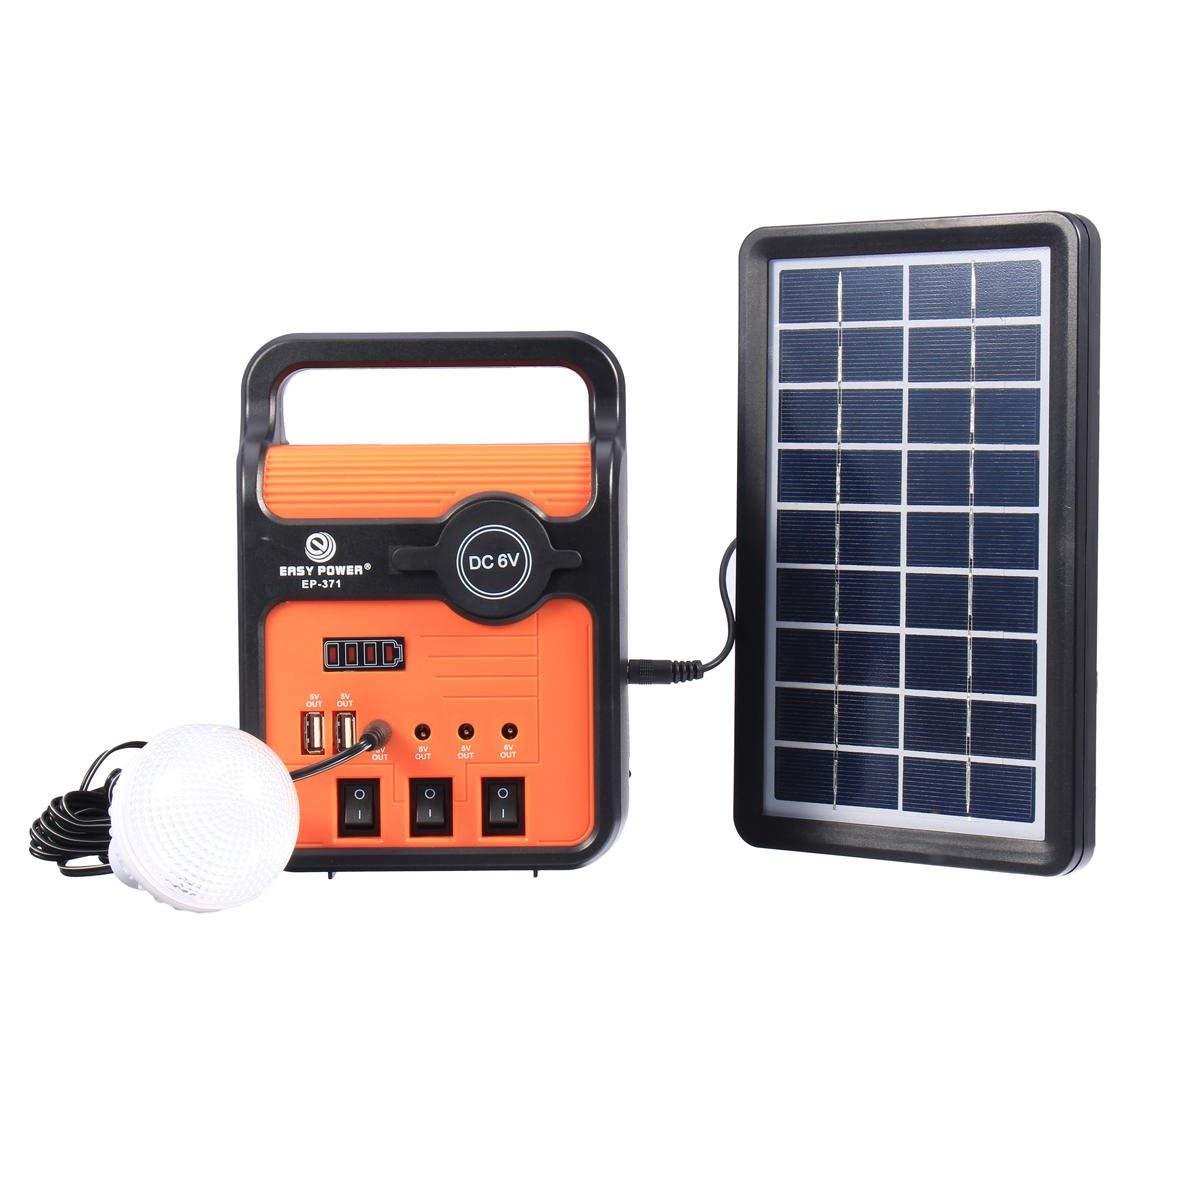 25W Solar Power System Power Generator With Solar Panel Bulbs with Sock USB Port - Electrical Equipment & Supplies Other Electrical Equipment - 1 x Hot Melt Glue Gun, 1 x Stand